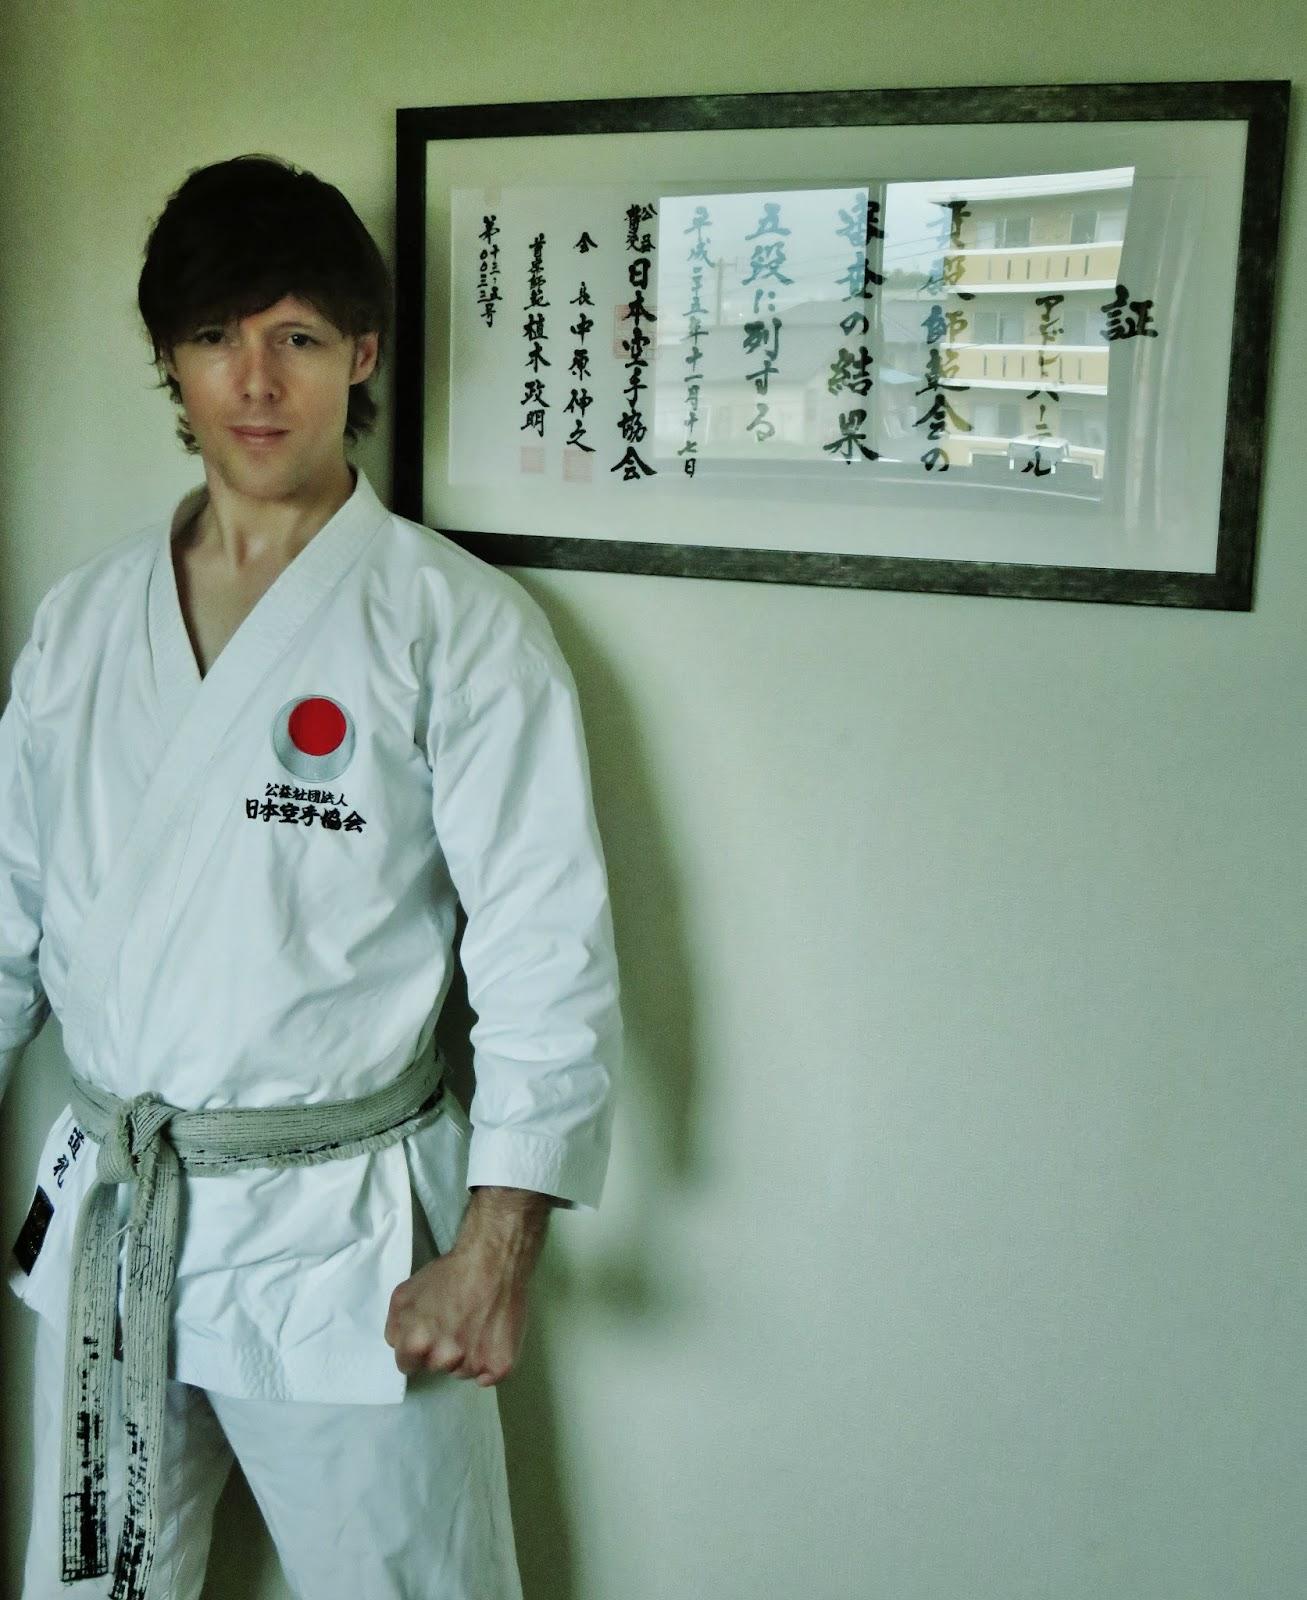 Best karate gi - Cheap custom made bobbleheads